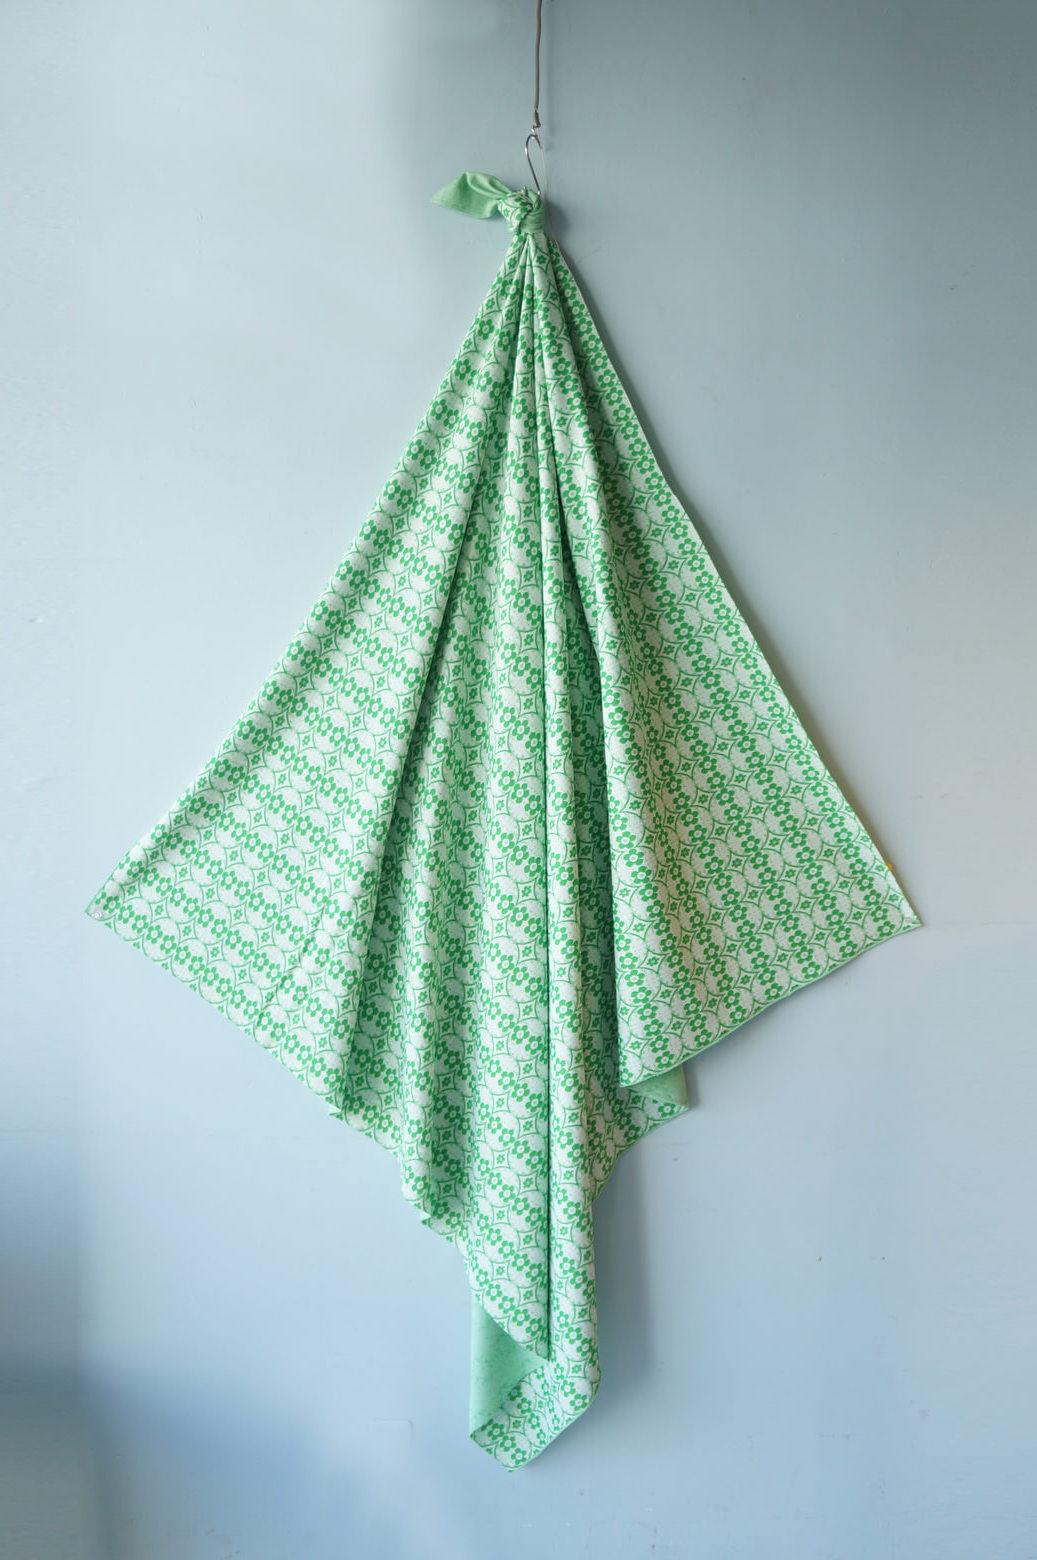 US Vintage Flower Print Jersey Fabric/アメリカ ヴィンテージ フラワープリント ファブリック ジャージー素材 レトロ 生地